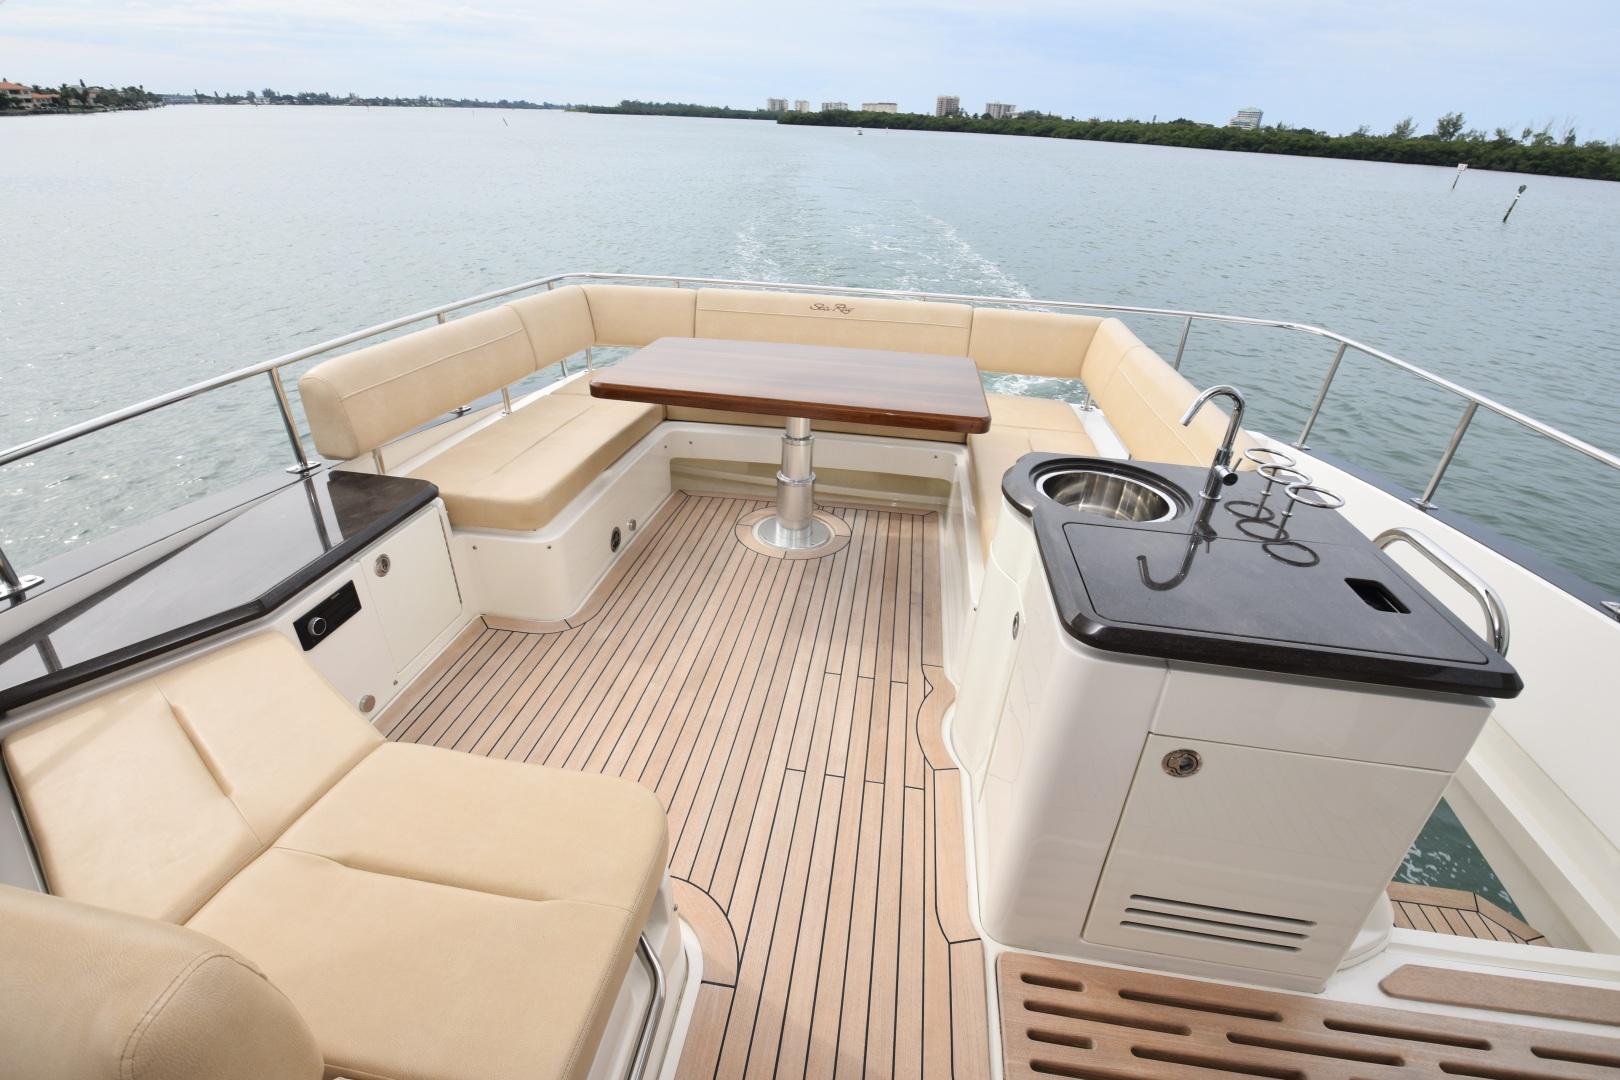 Sea Ray-L650 2016-3x's the Charm Longboat Key-Florida-United States-2016 Sea Ray L650  3x's the Charm  Flybridge-1251842 | Thumbnail